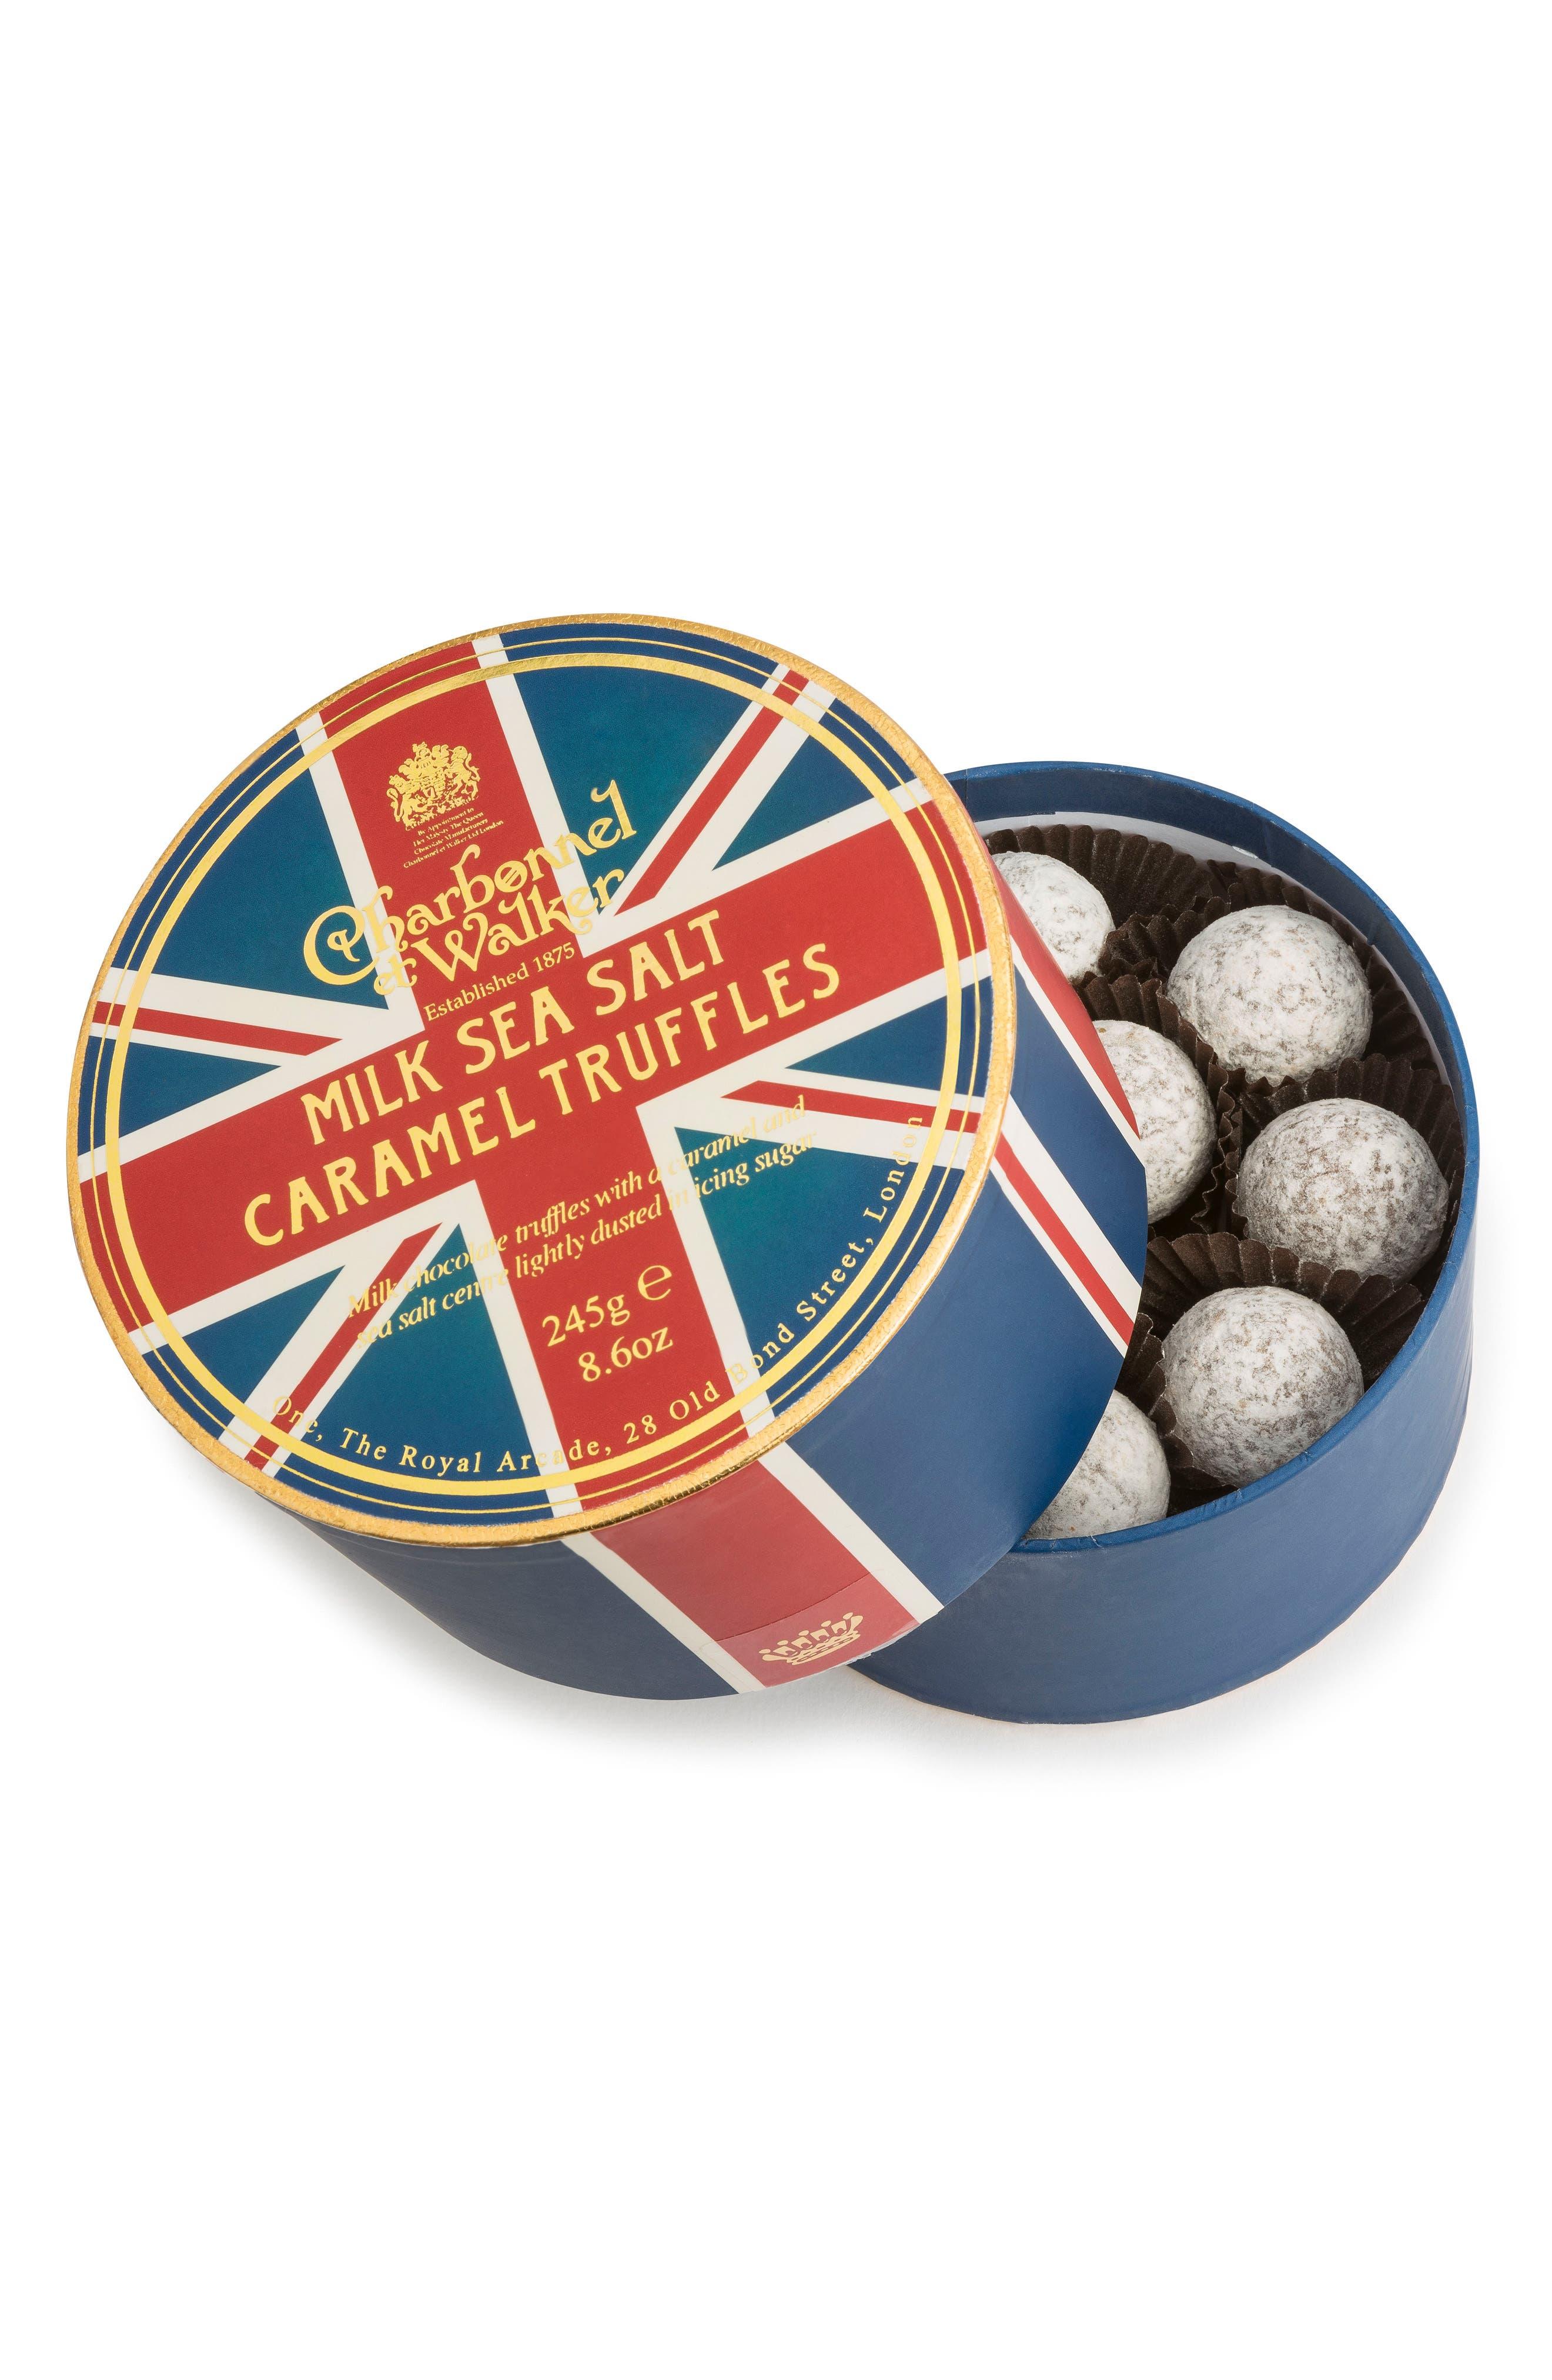 Sea Salt Milk Chocolate Truffles in Union Flag Gift Box,                             Main thumbnail 1, color,                             RED/ BLUE